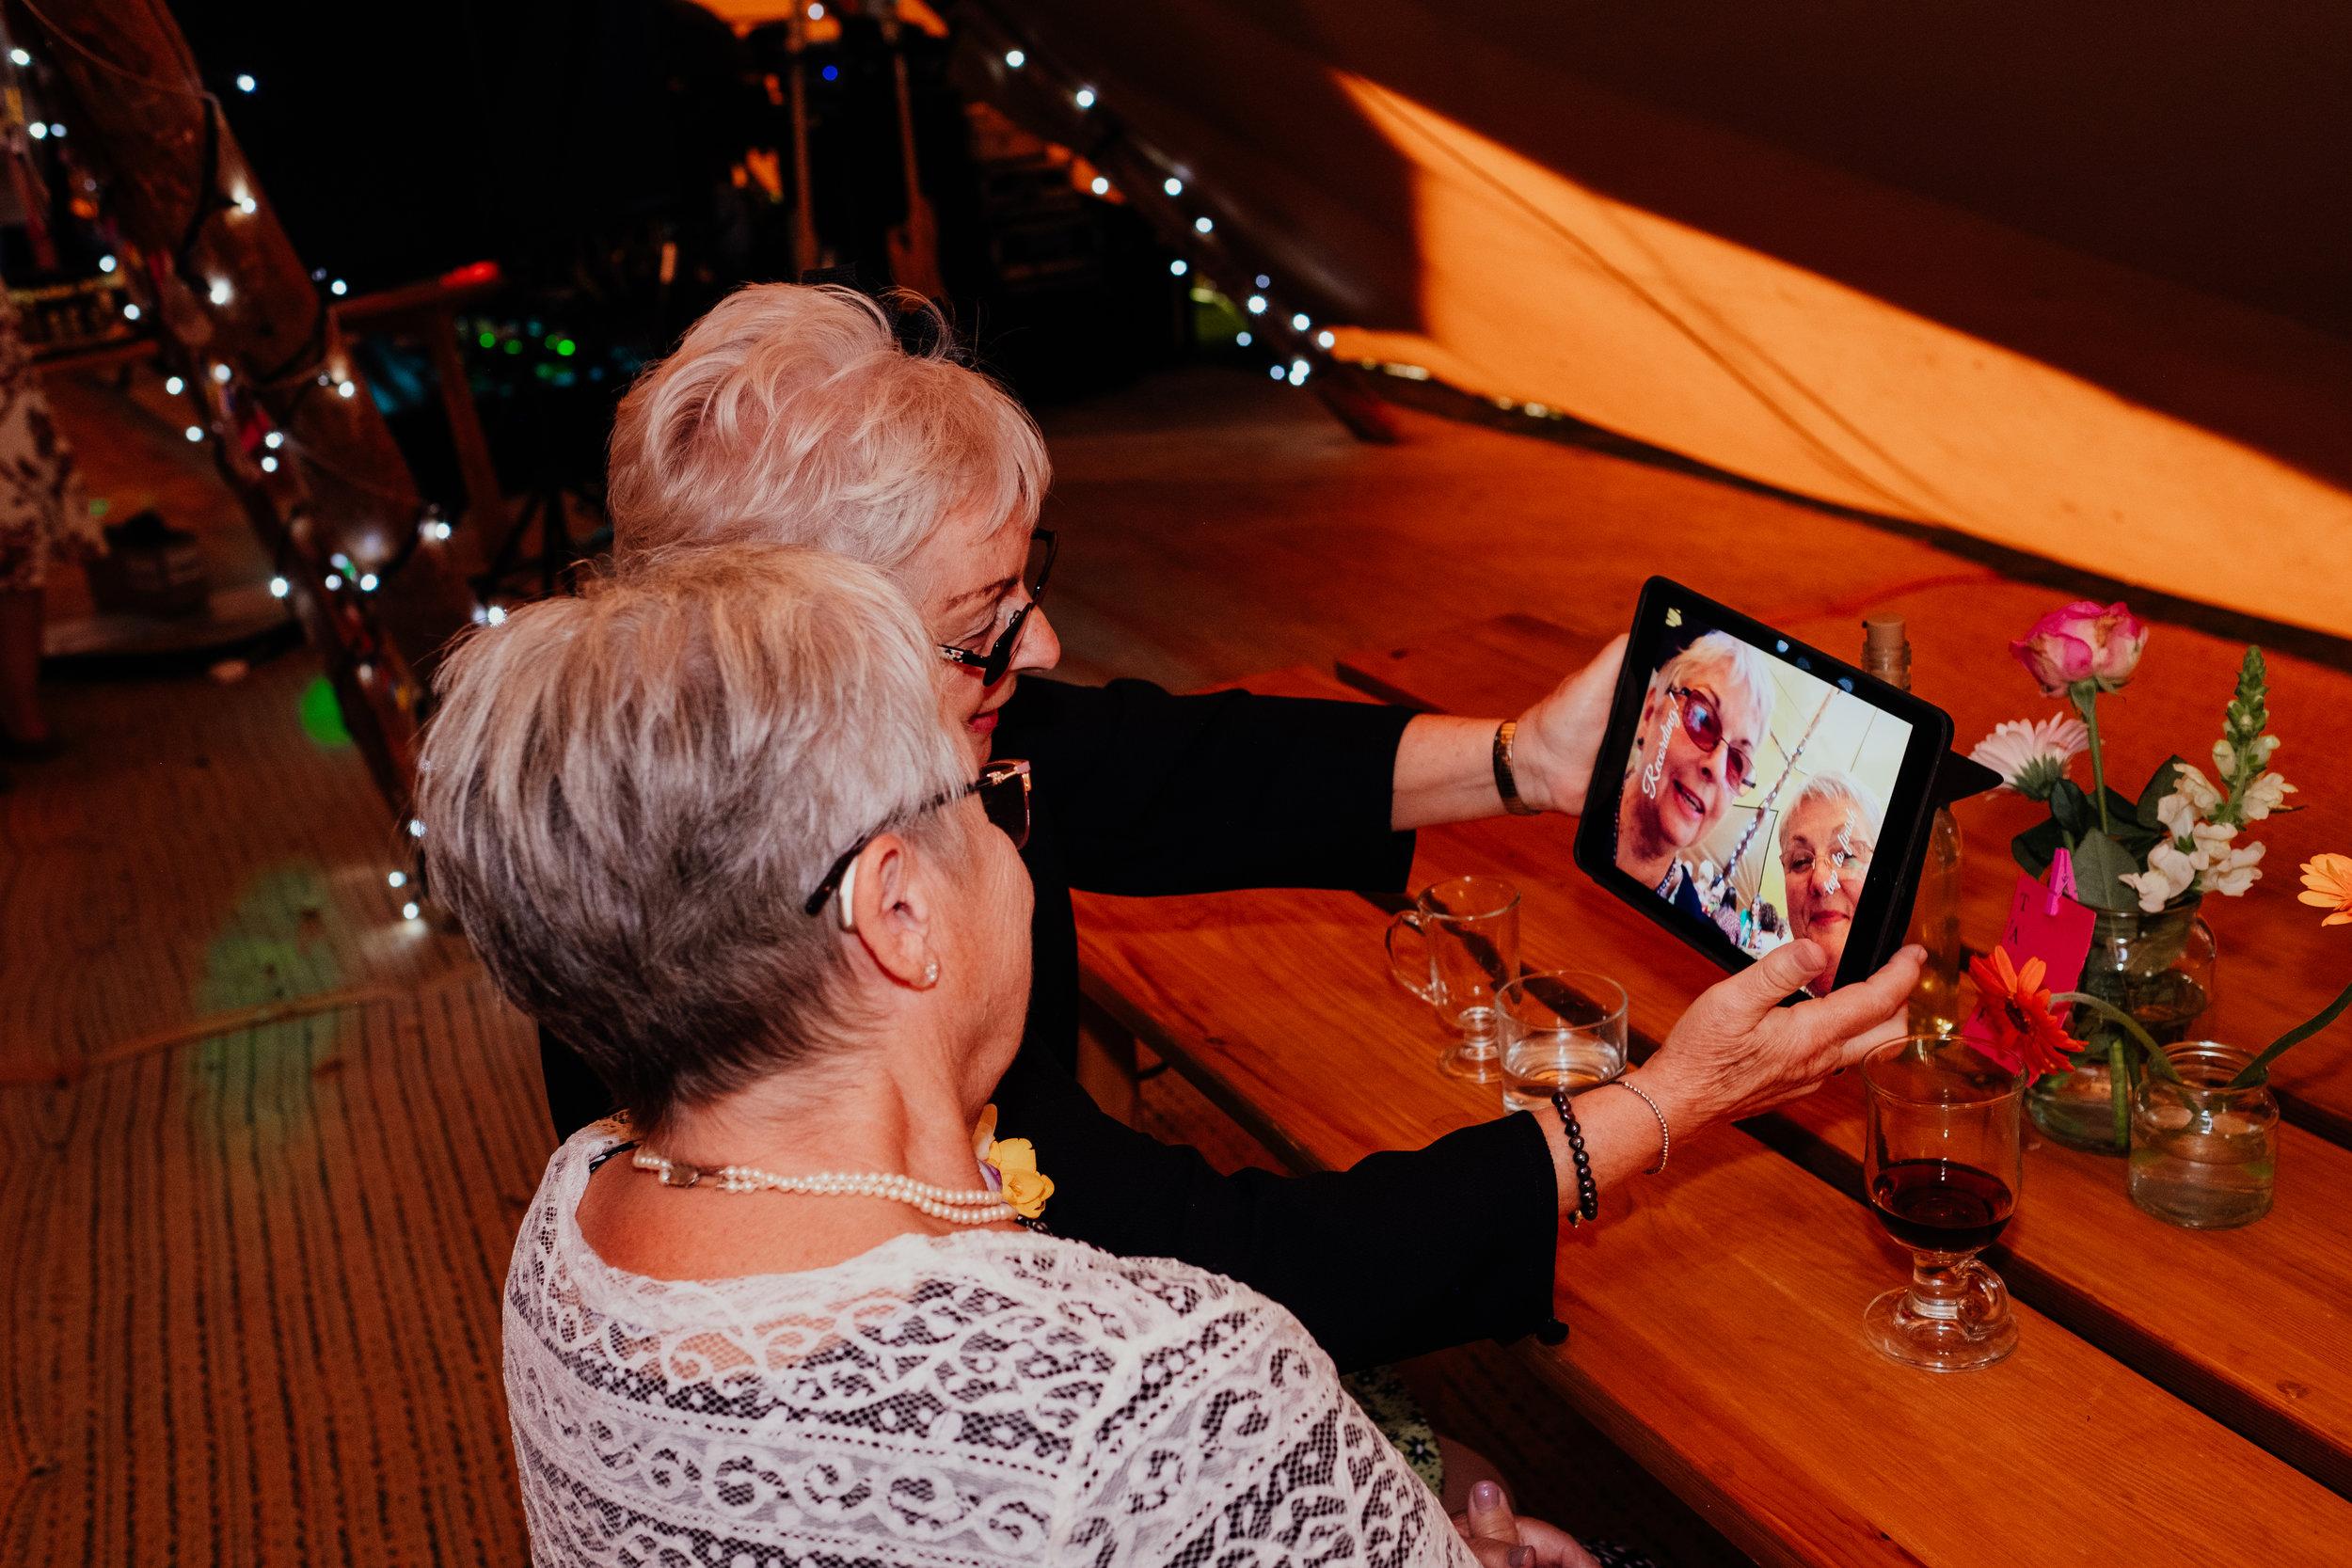 Wedding guests recording congratulations message on iPad